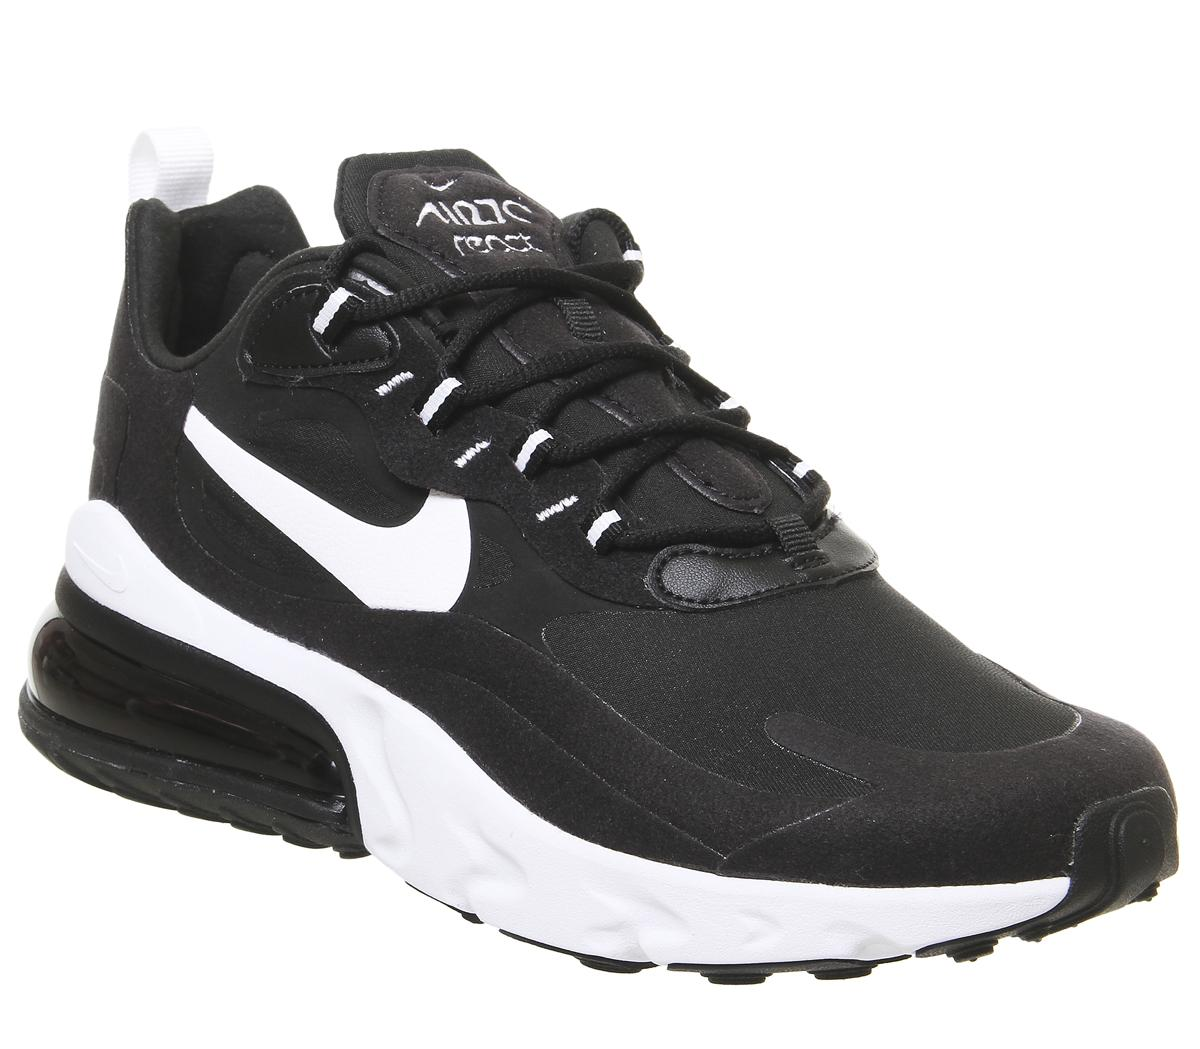 Nike Air Max 270 React Trainers Black